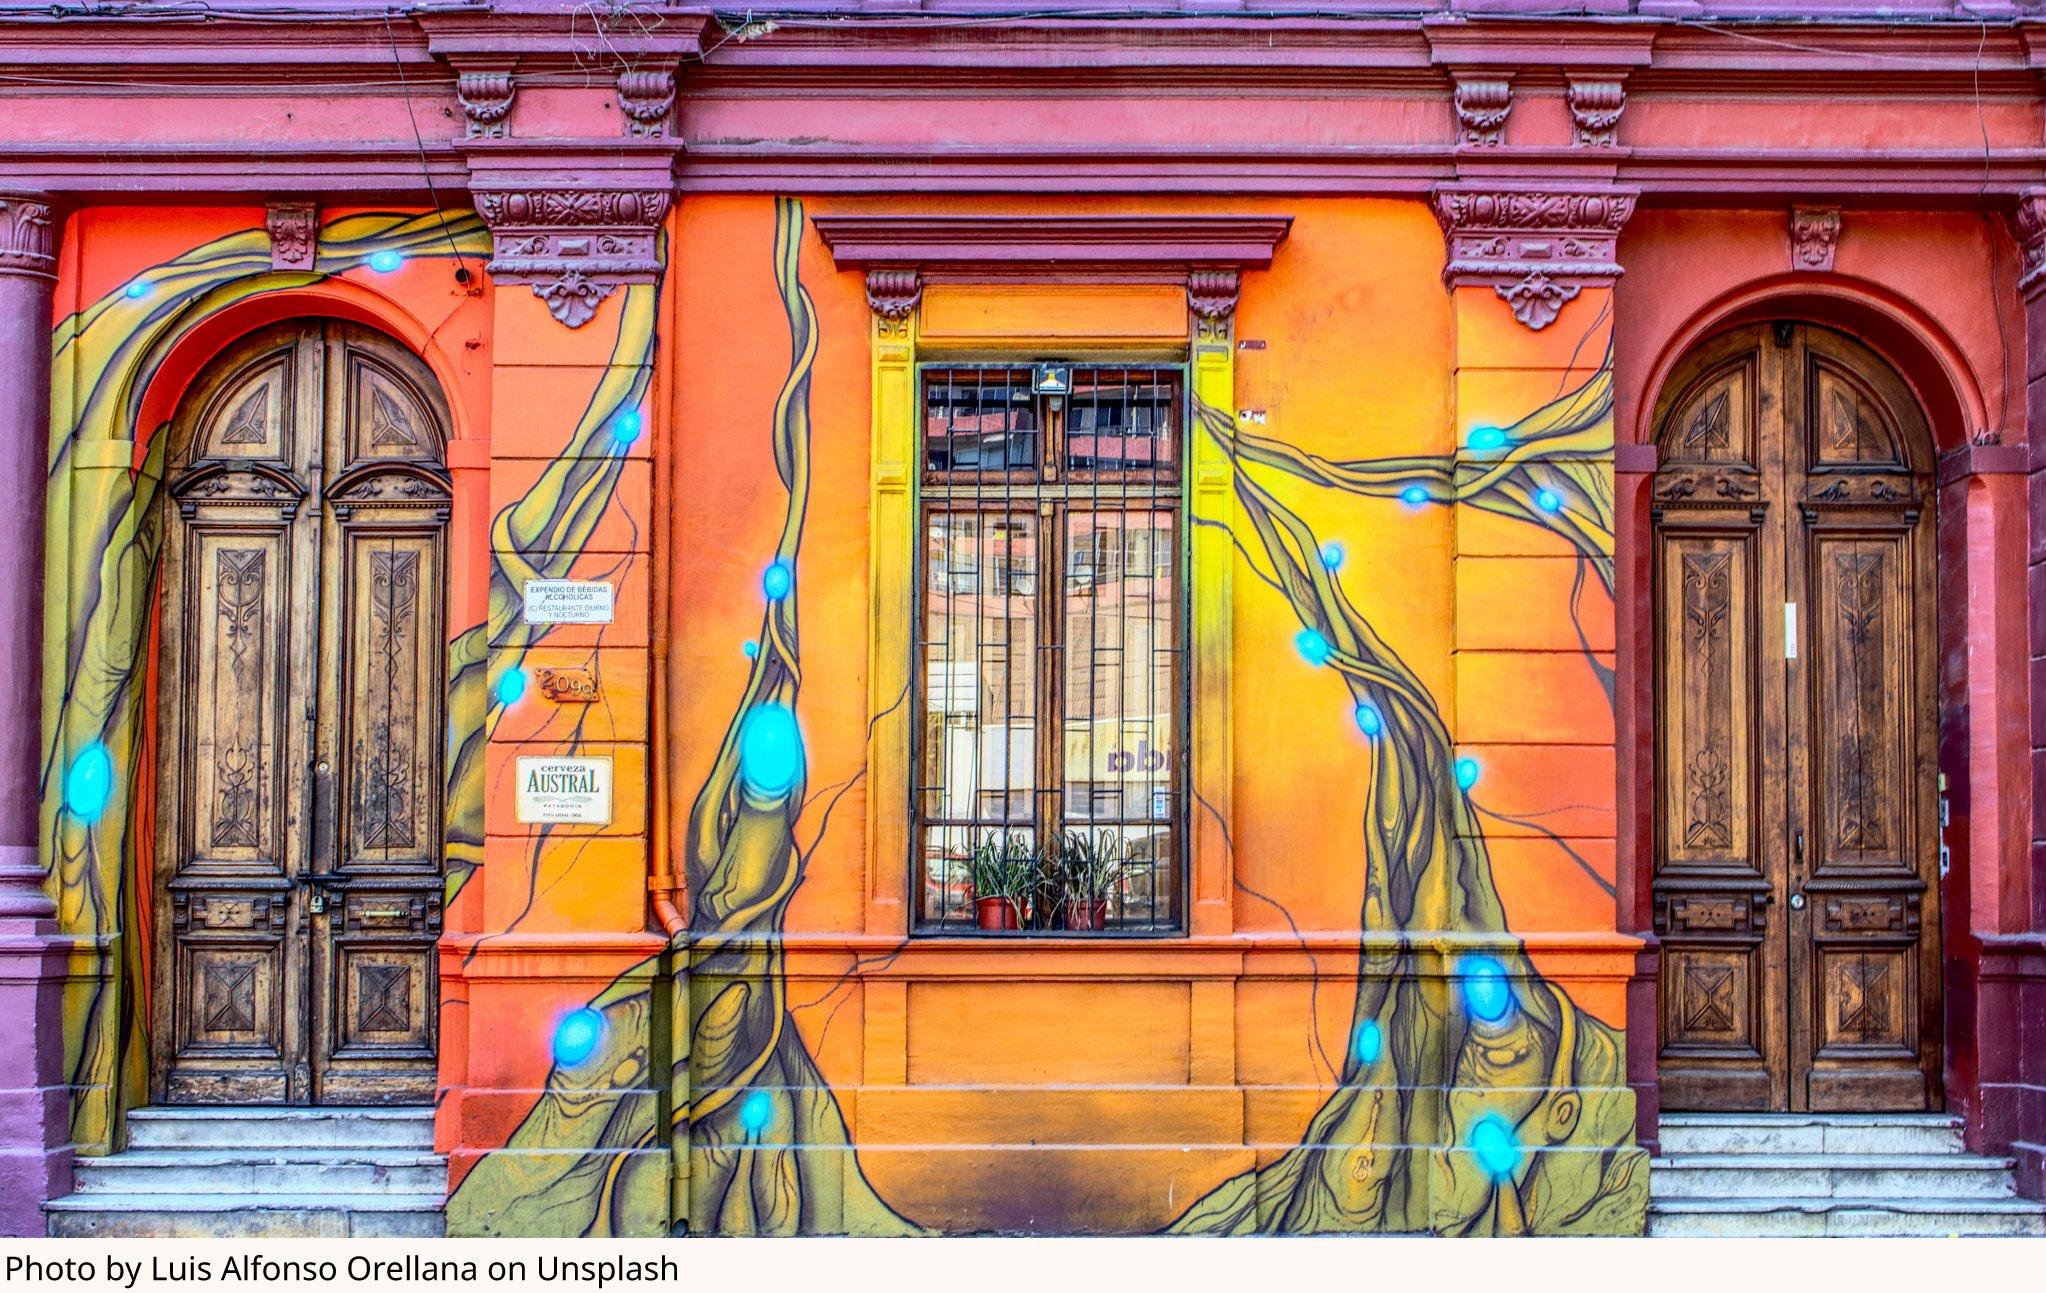 Photo by Luis Alfonso Orellana on Unsplash